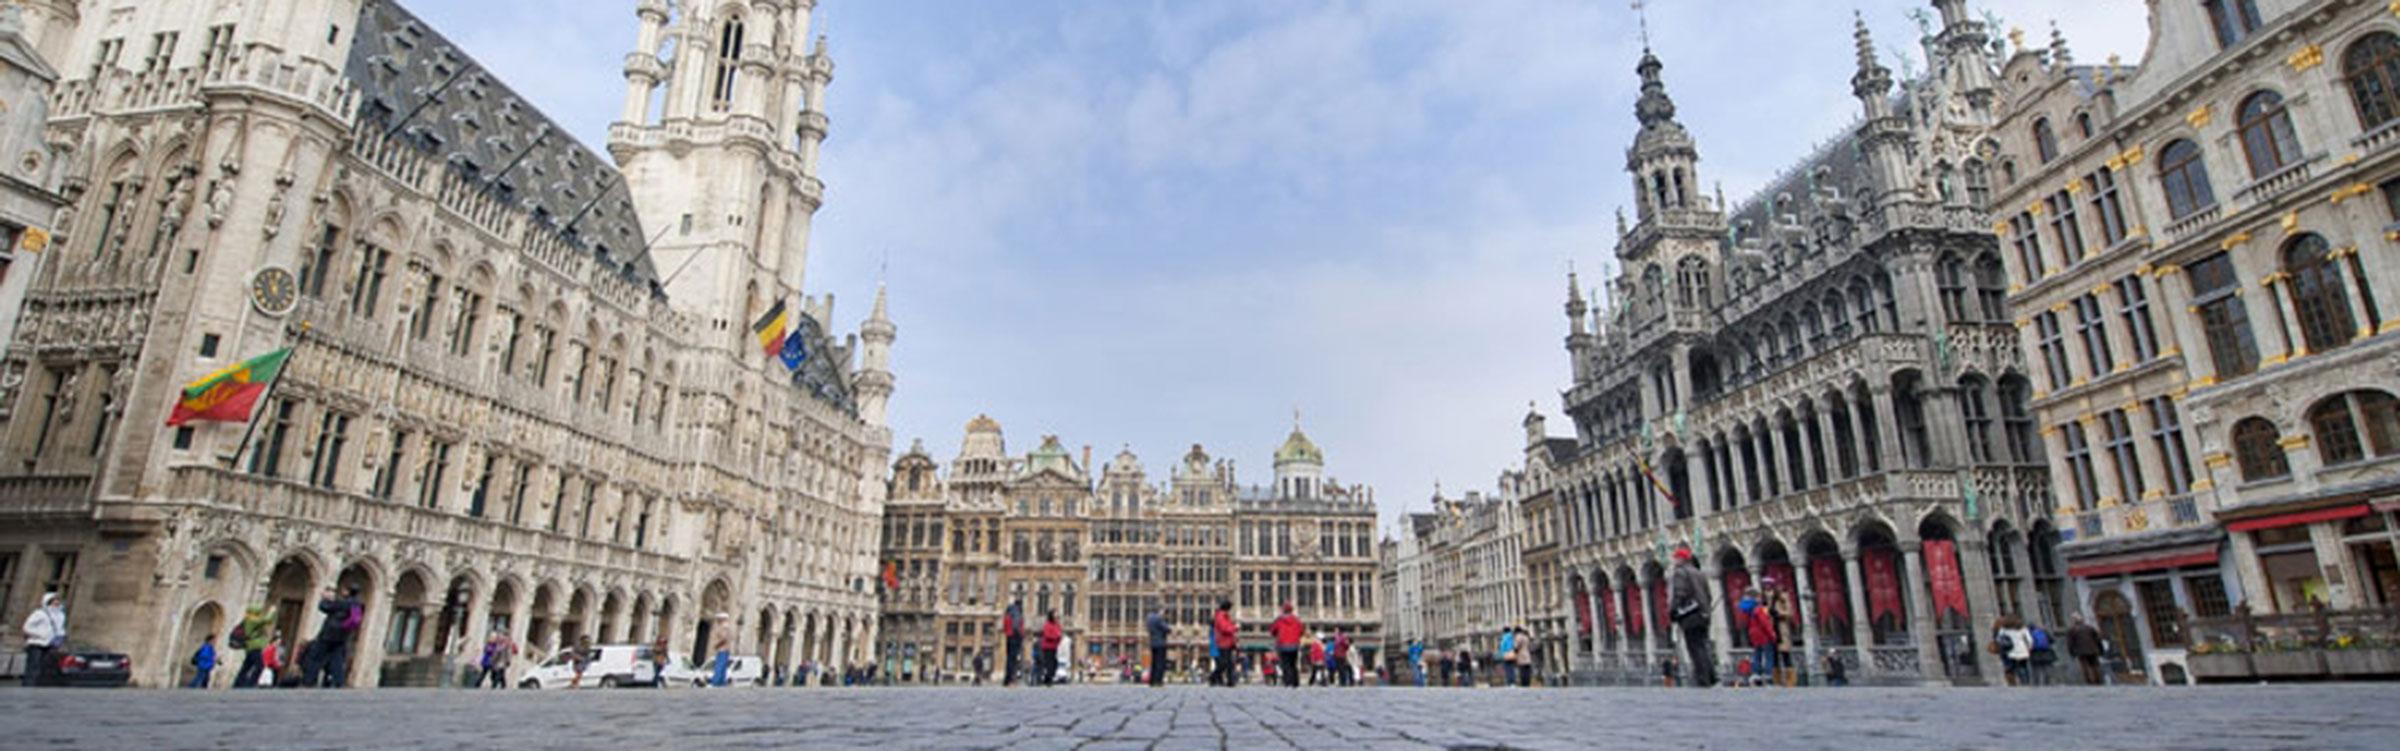 Brussel algemeen